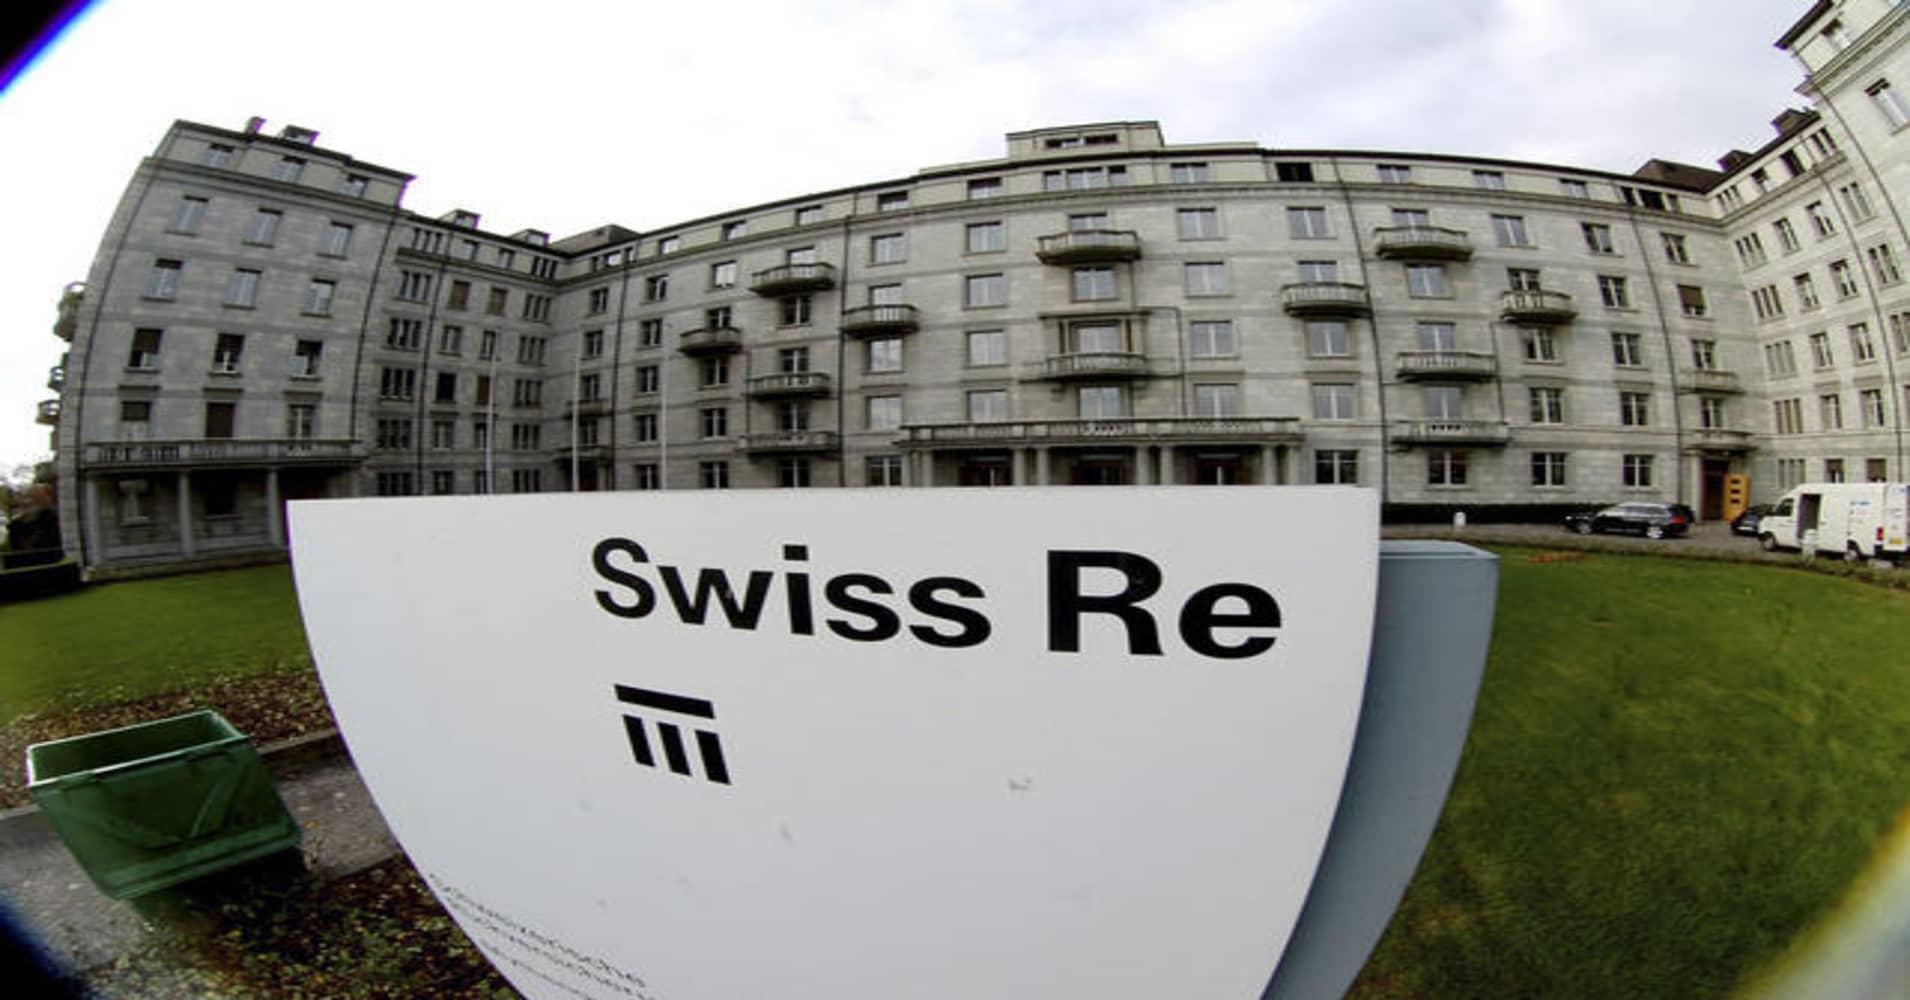 Fires, typhoons push Swiss Re's Q4 claims burden to $1.3 billion